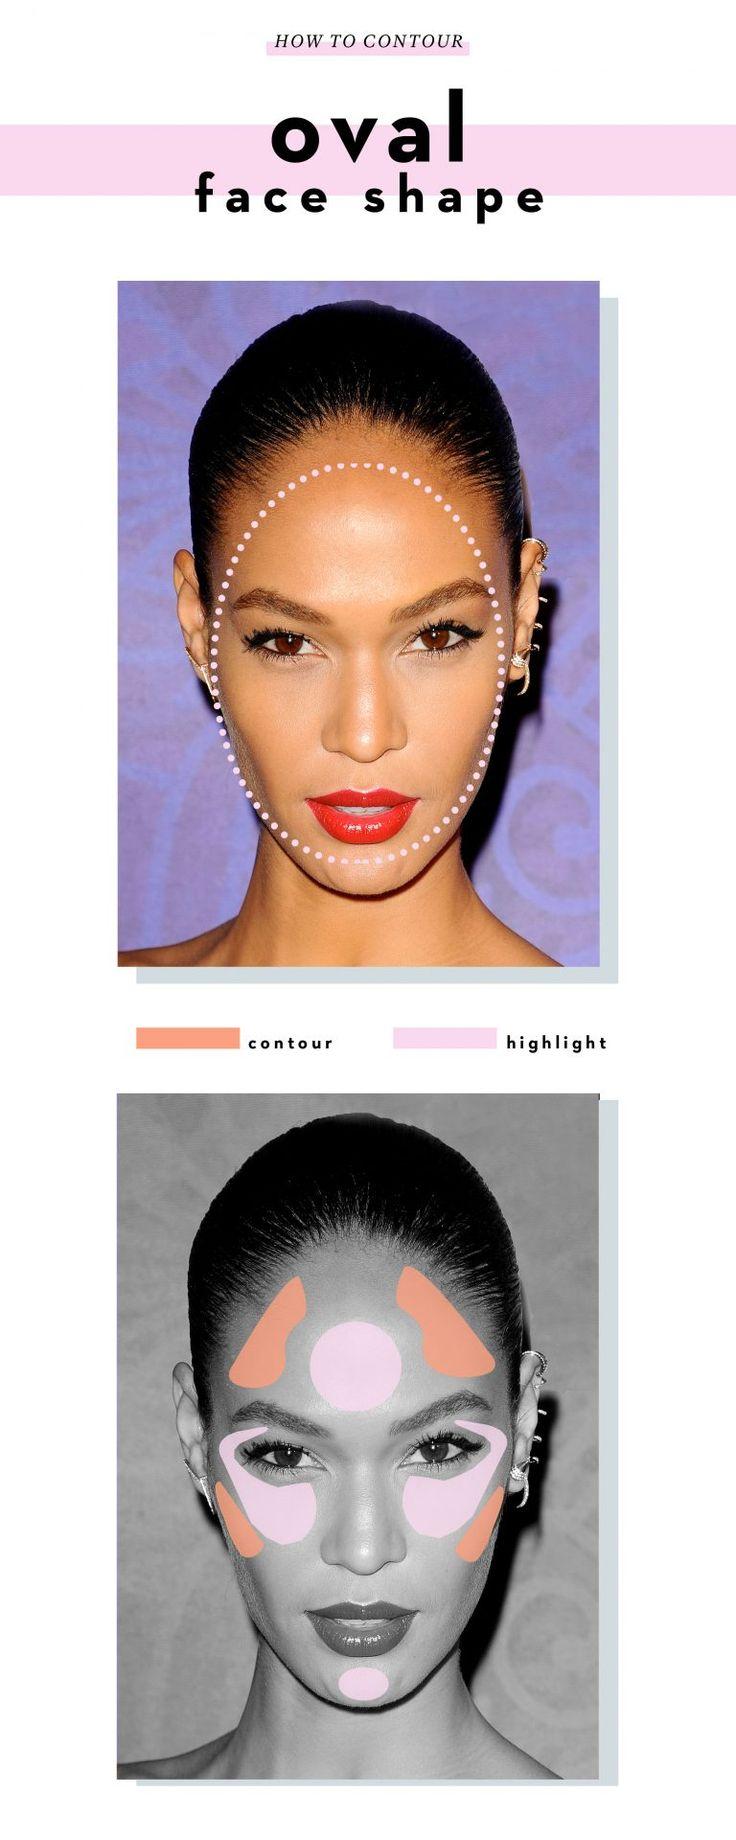 How to contour like a professional makeup artist